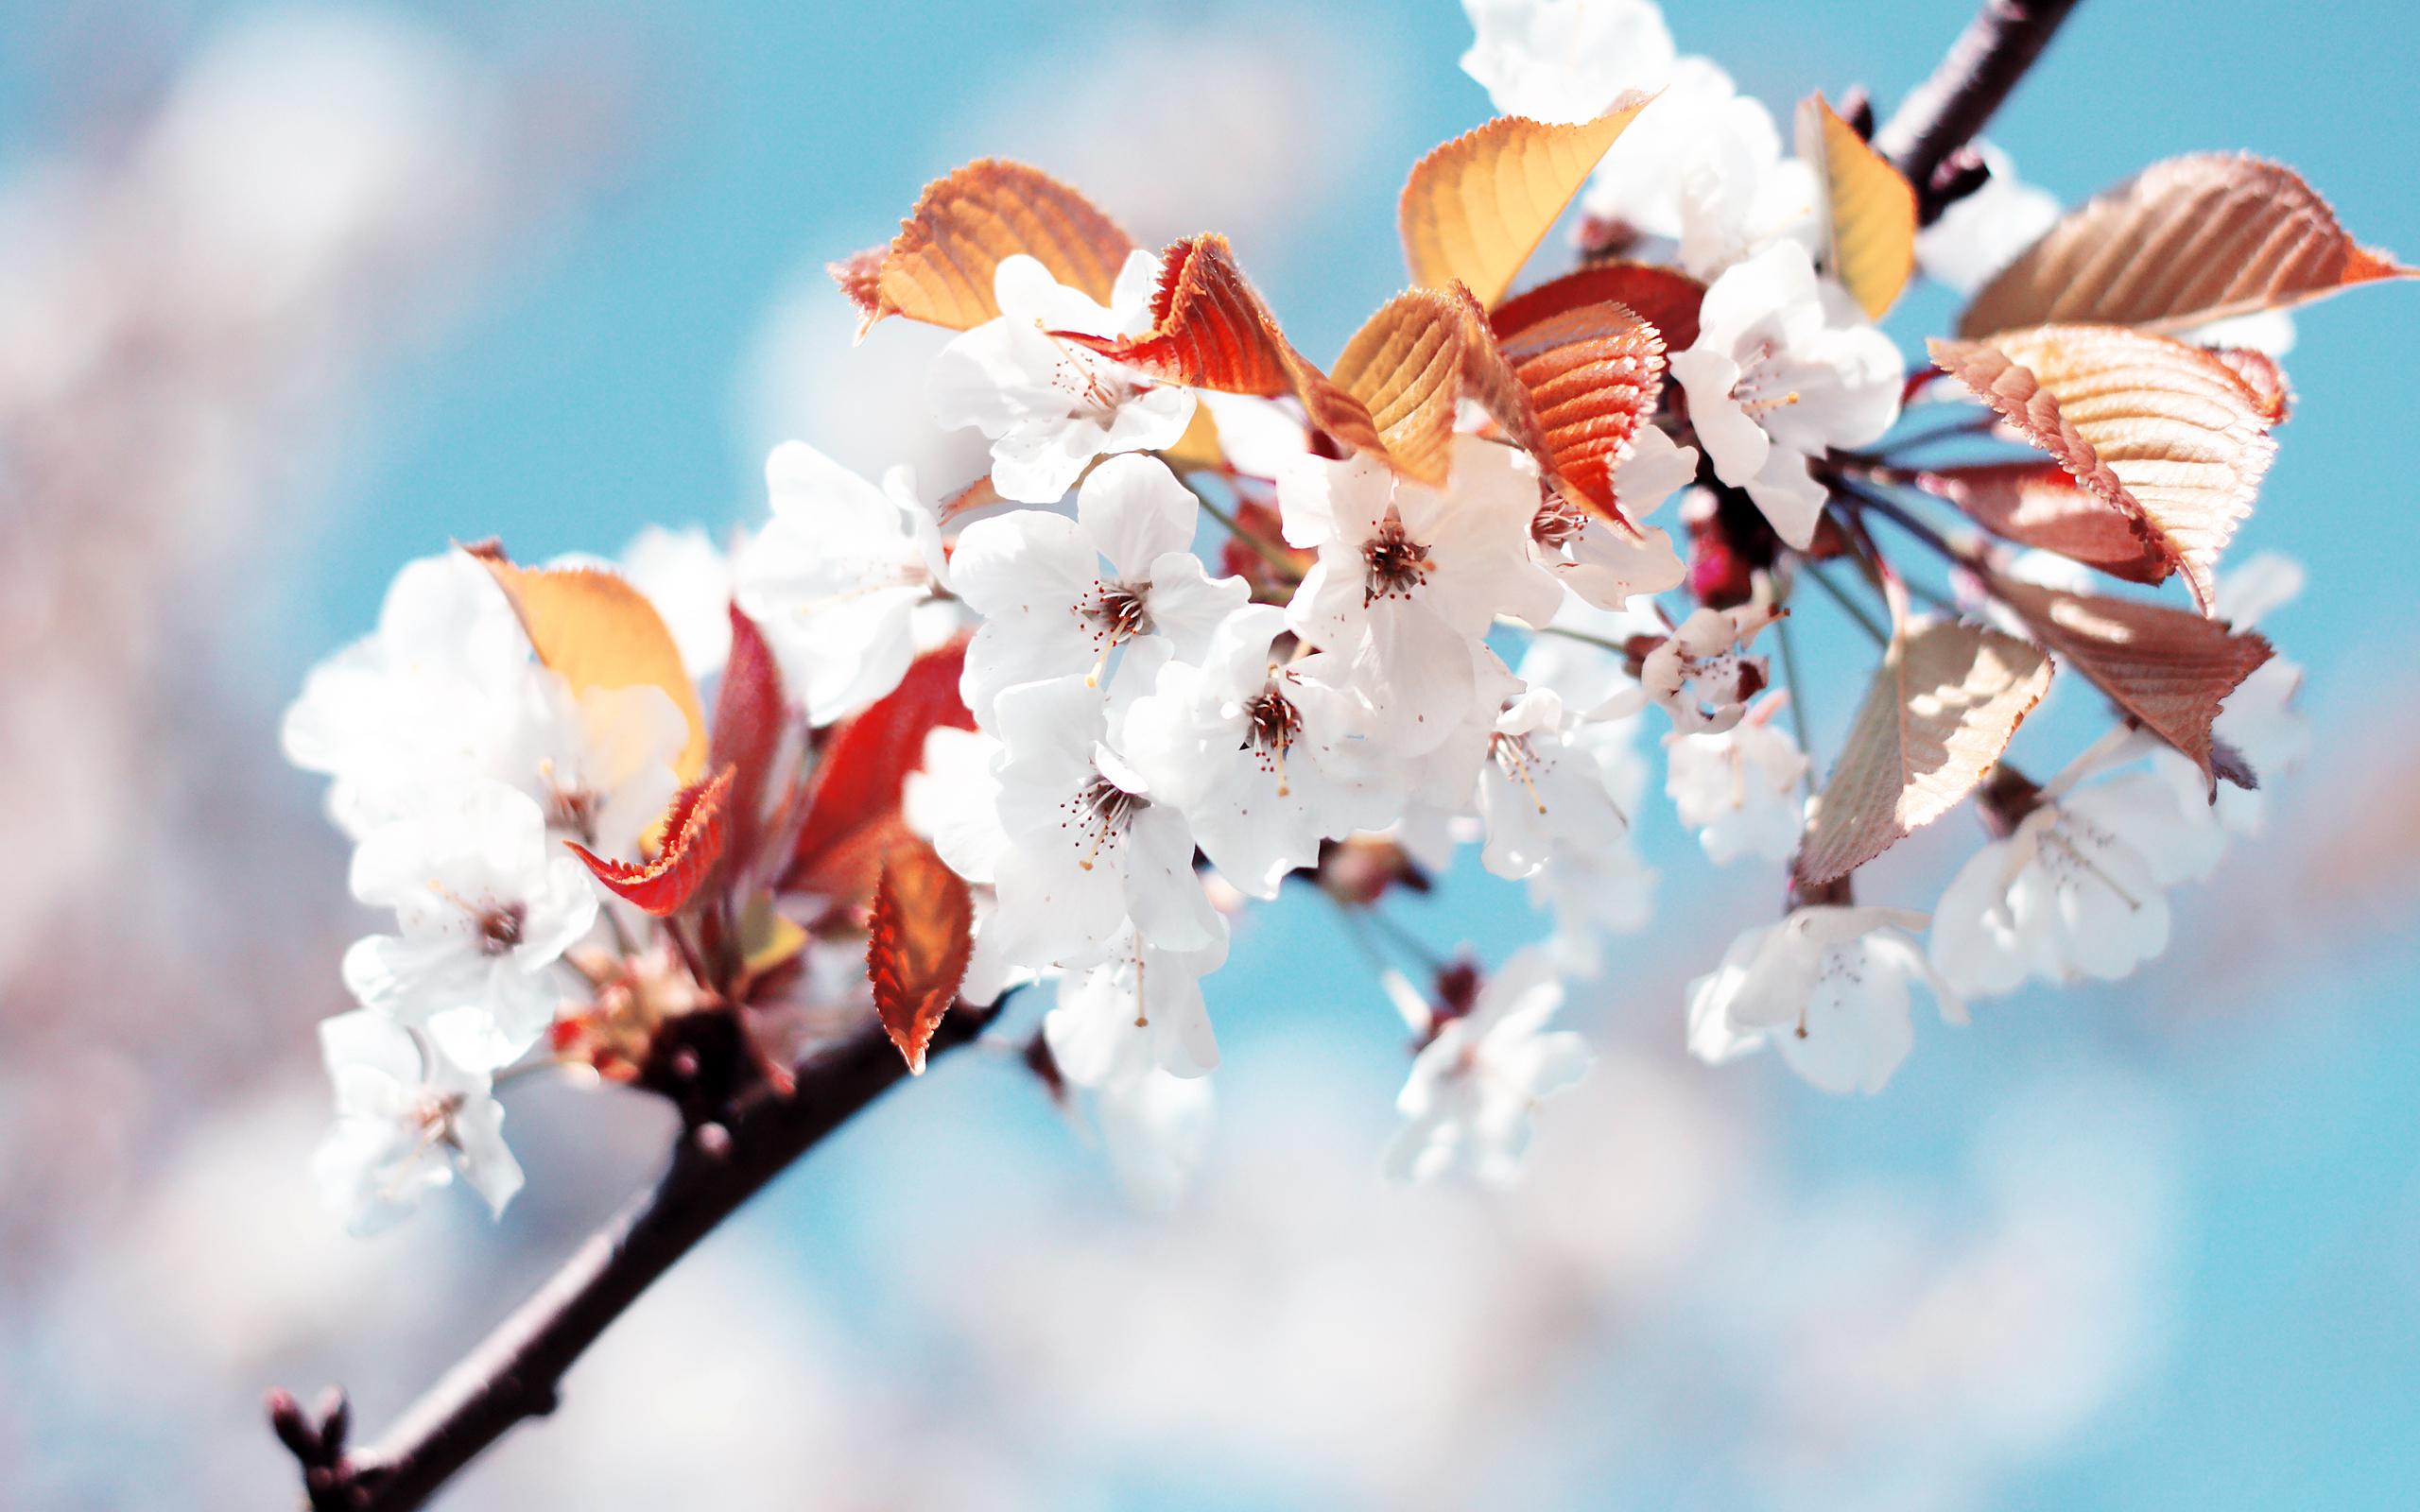 Fondos Flores ADNFriki (5)